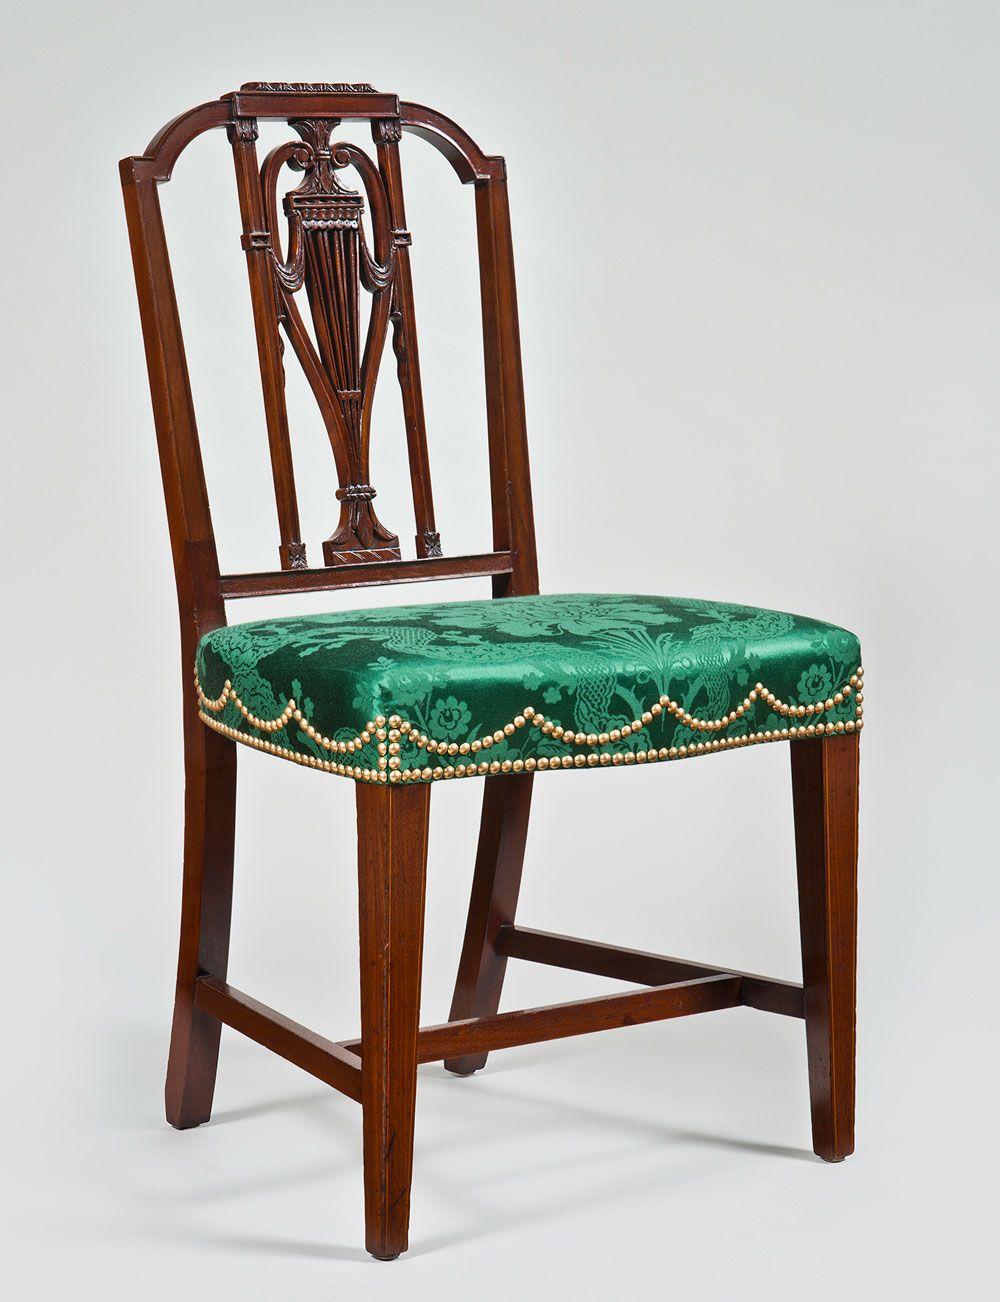 https://www.incollect.com/articles/john-aitken-the-scottish-born-cabinetmaker-creates-classical-philadelphia?utm_source=Facebook